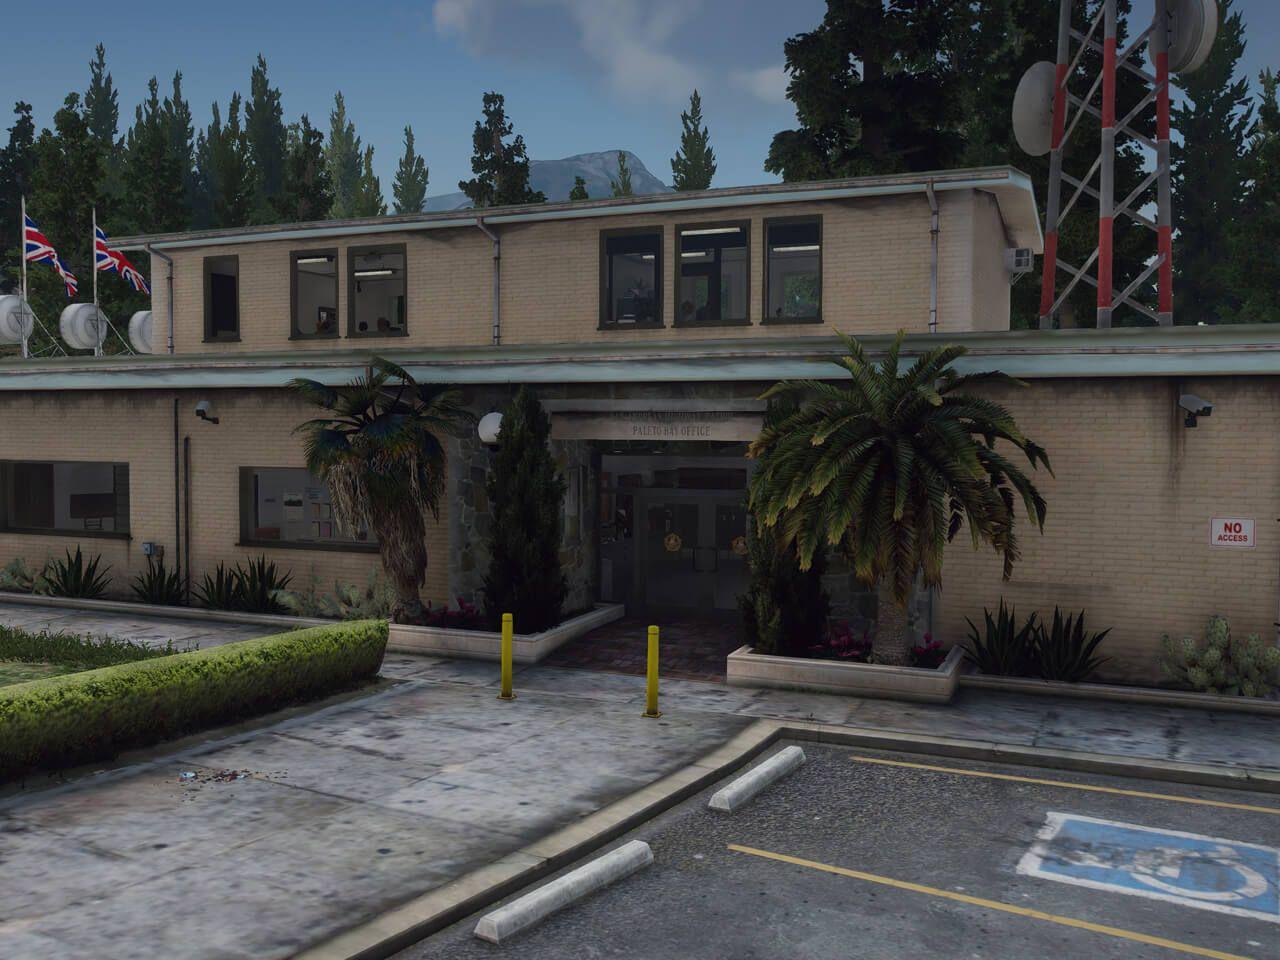 Paleto Bay Police Station